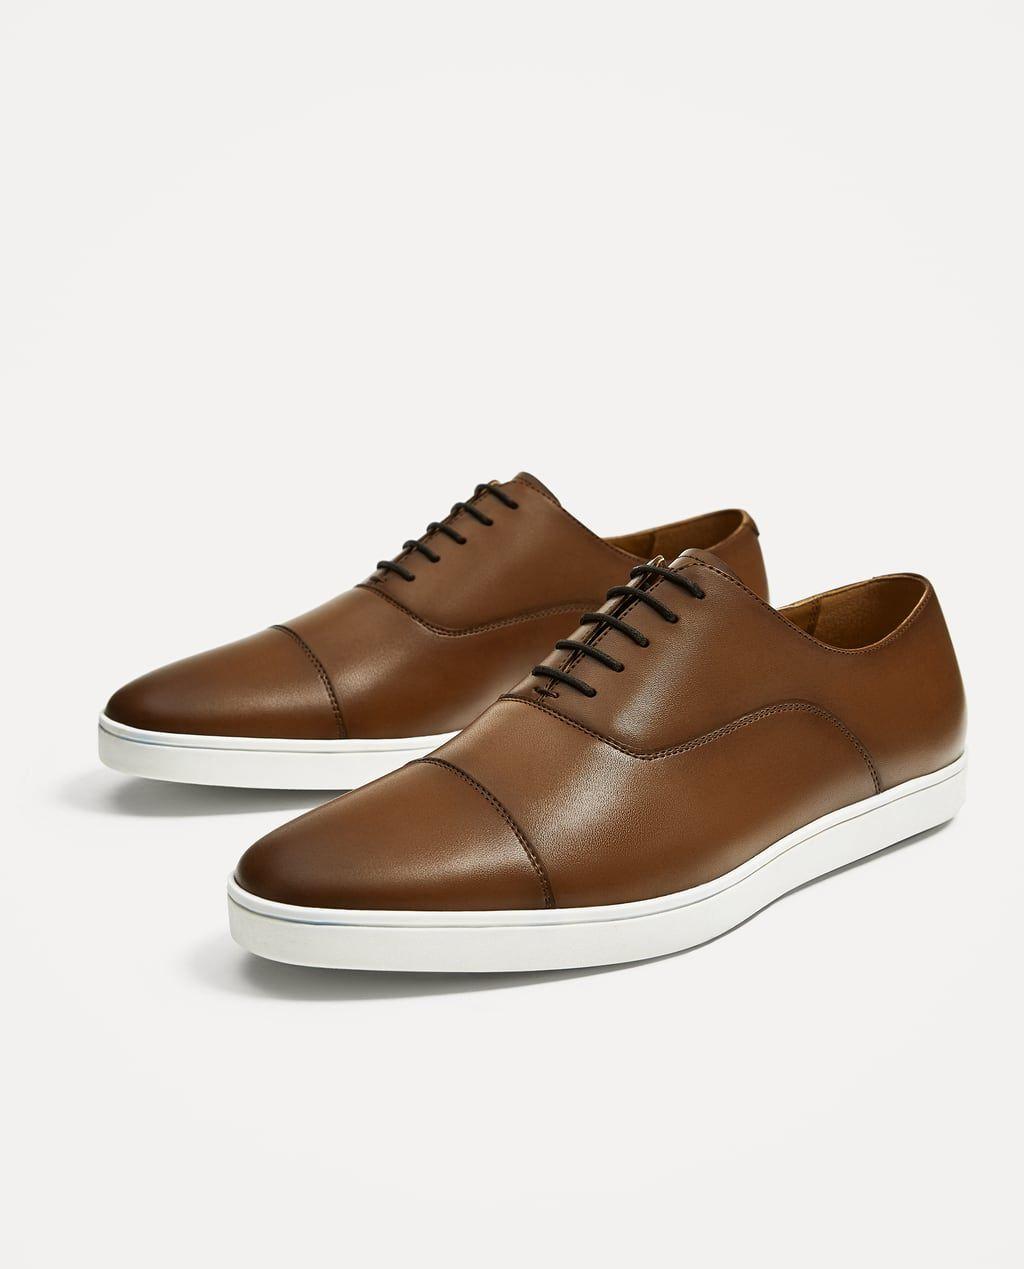 Casual Zapato Todo Zara 2018 Colombia Zapatos Rebajas Hombre Ver 1HqxdZrH